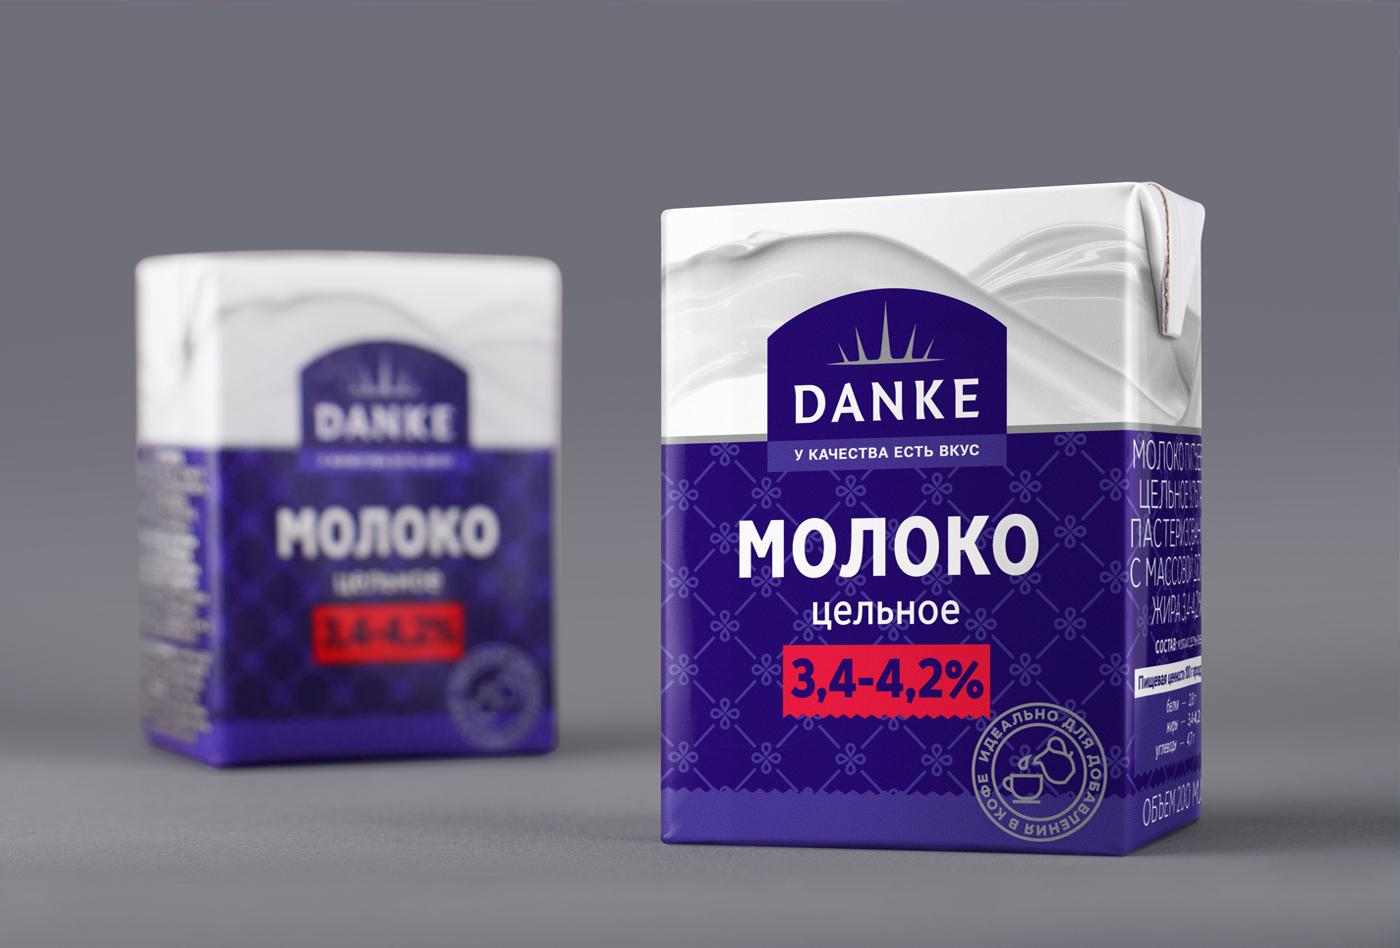 AIDA PIONEER Branding & Creative – DANKE dairy products